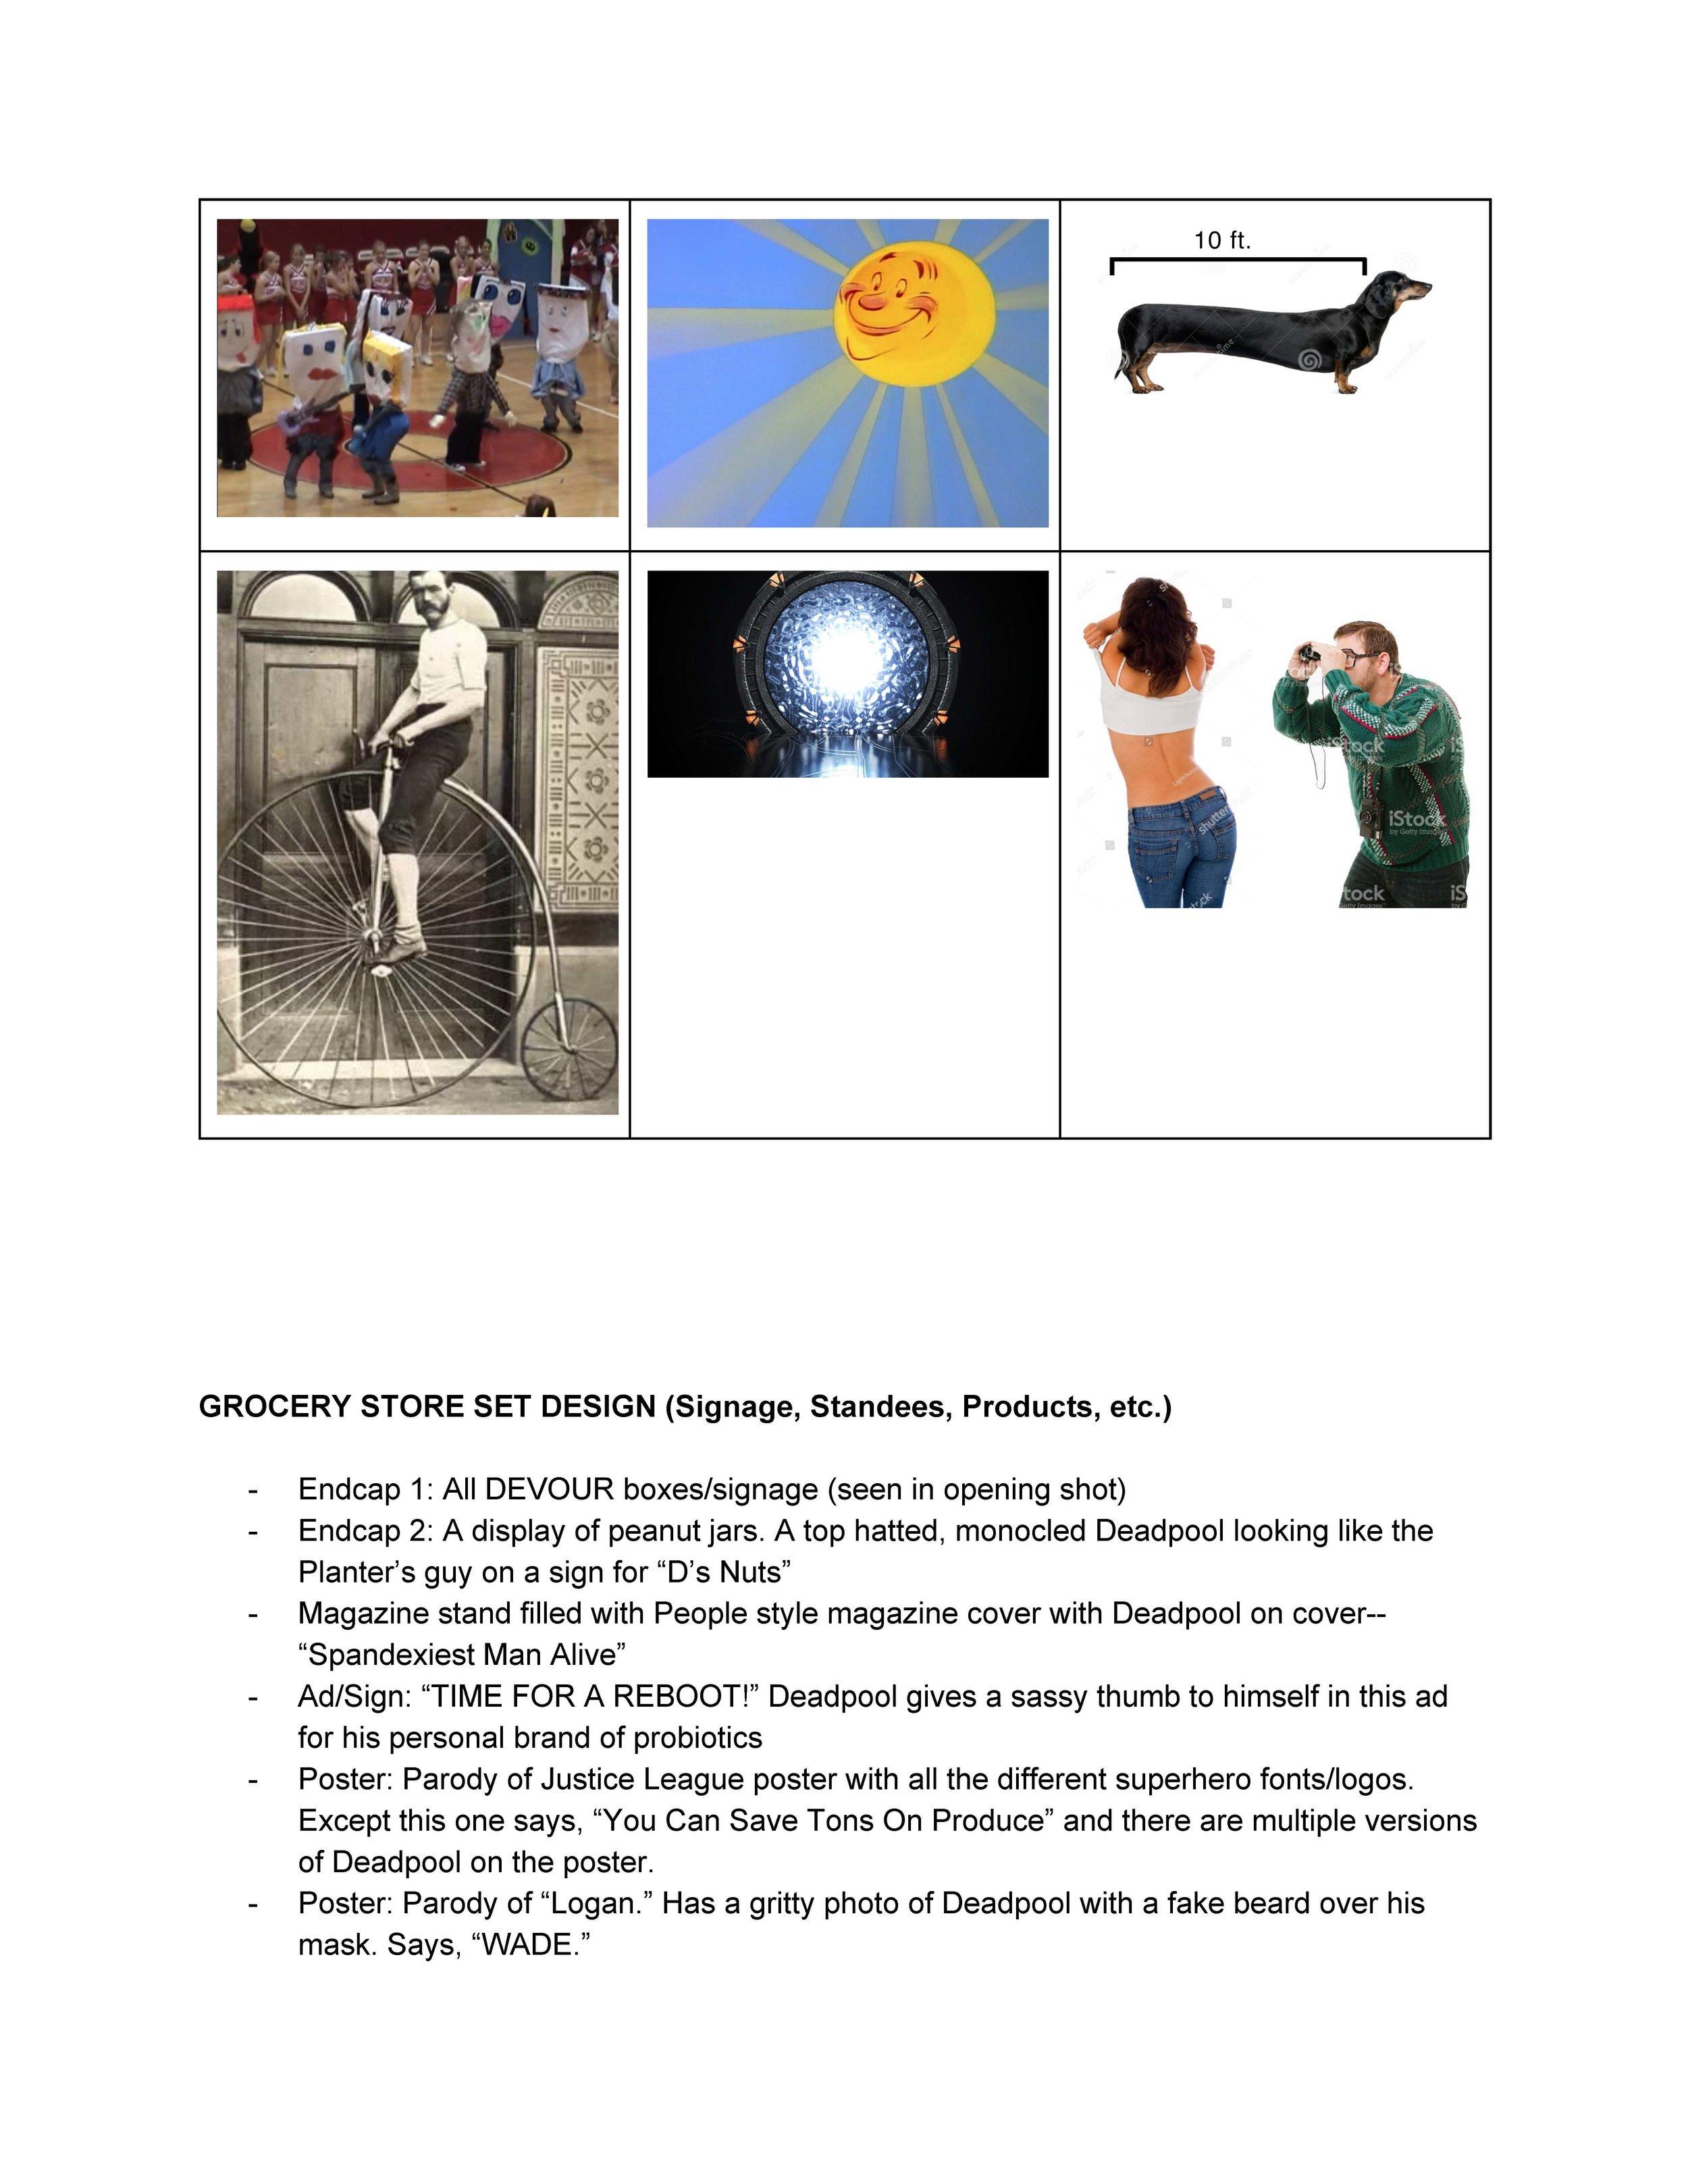 Kraft Deadpool - case study_Page_05.jpg